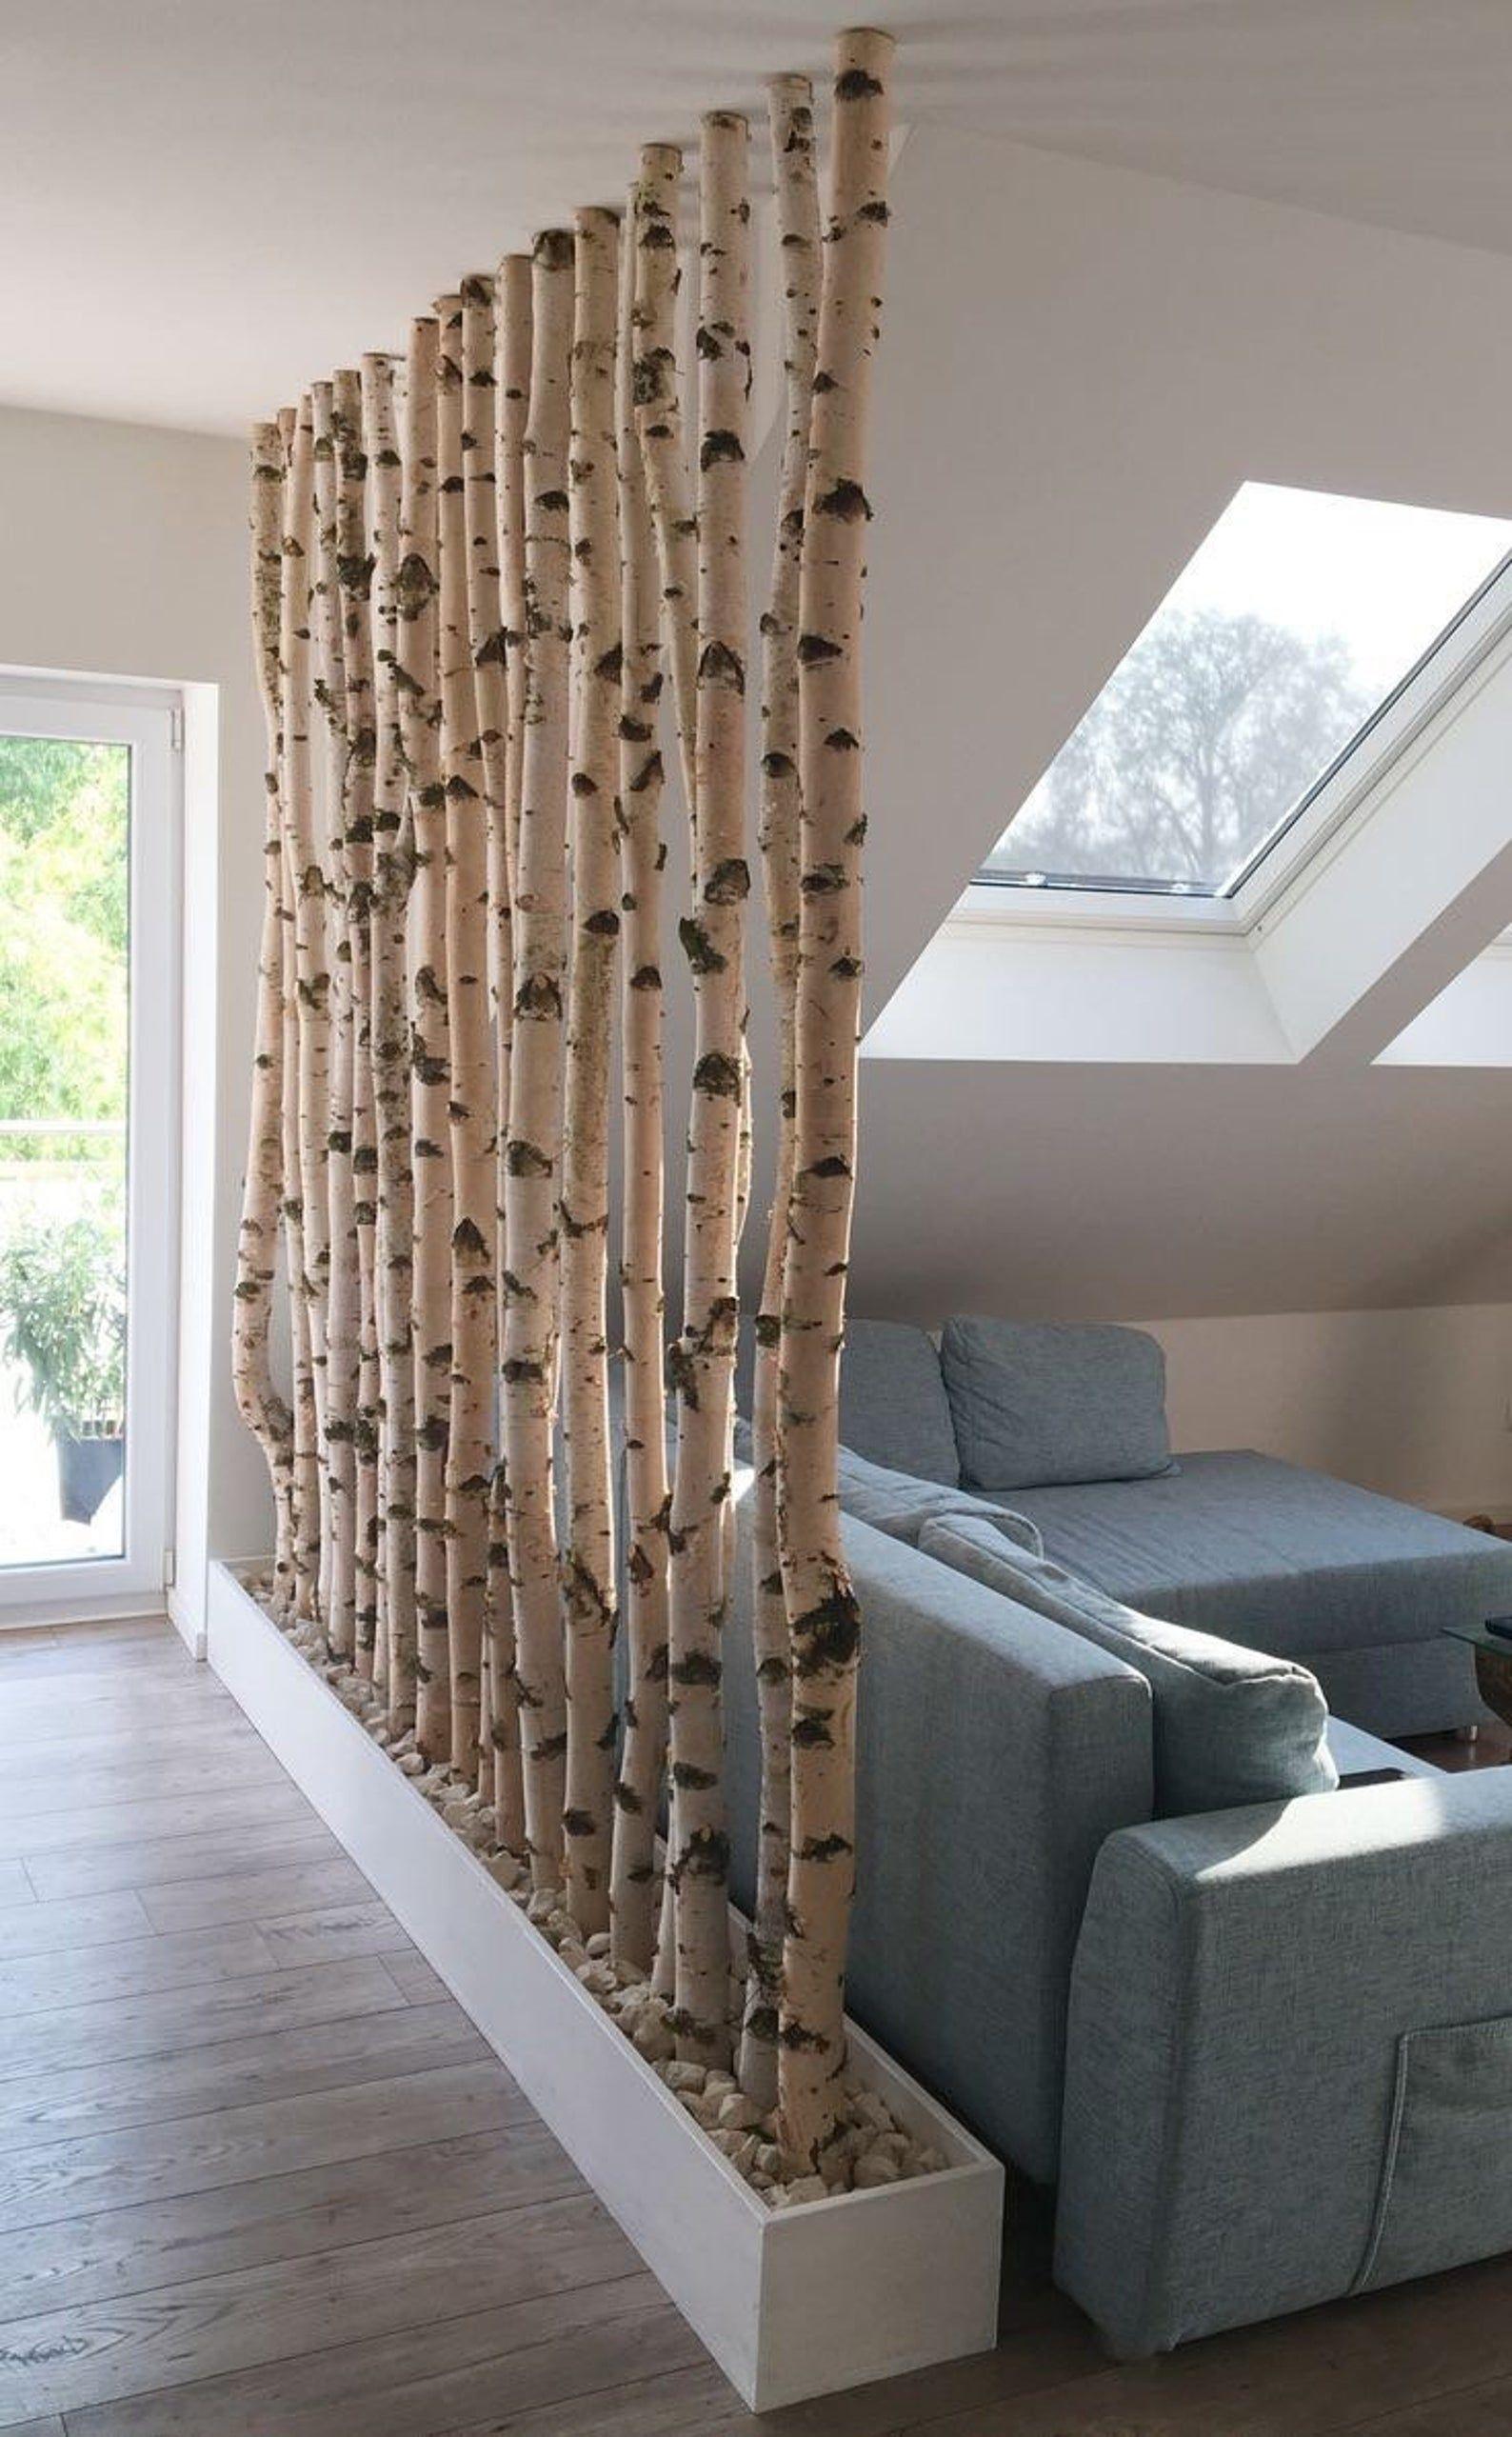 SET OF 5 natural birch poles, framed birch art, large wall art, branch decor, birch trees wall art, white birch forest, high quality